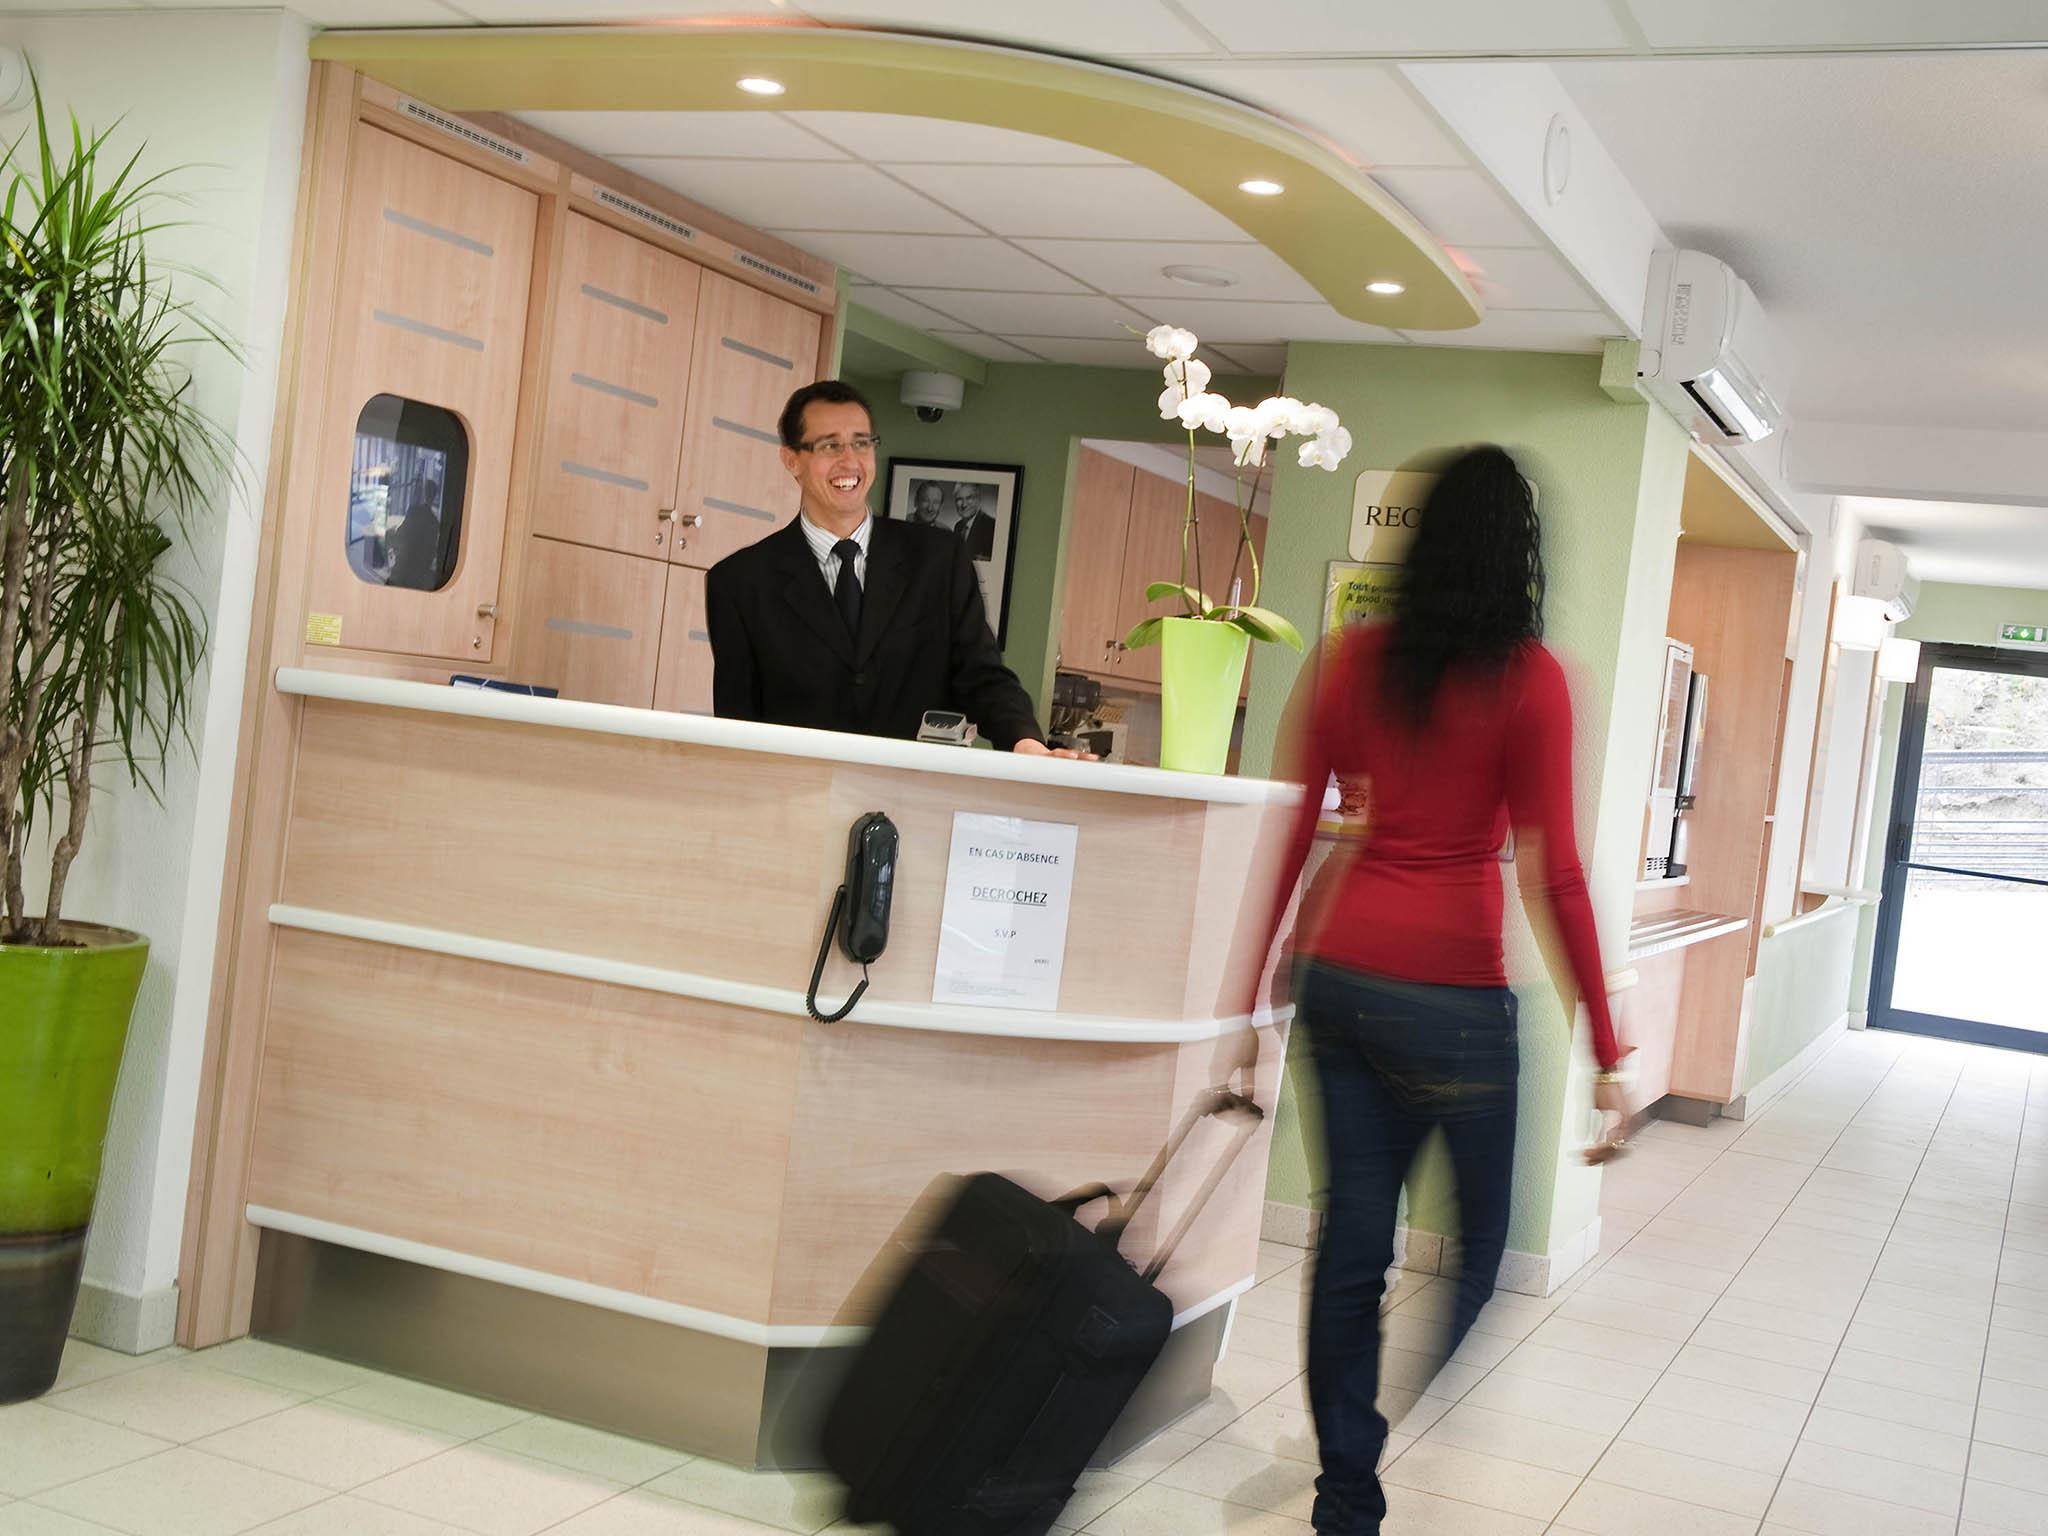 Hotel – ibis budget Cosne Sur Loire